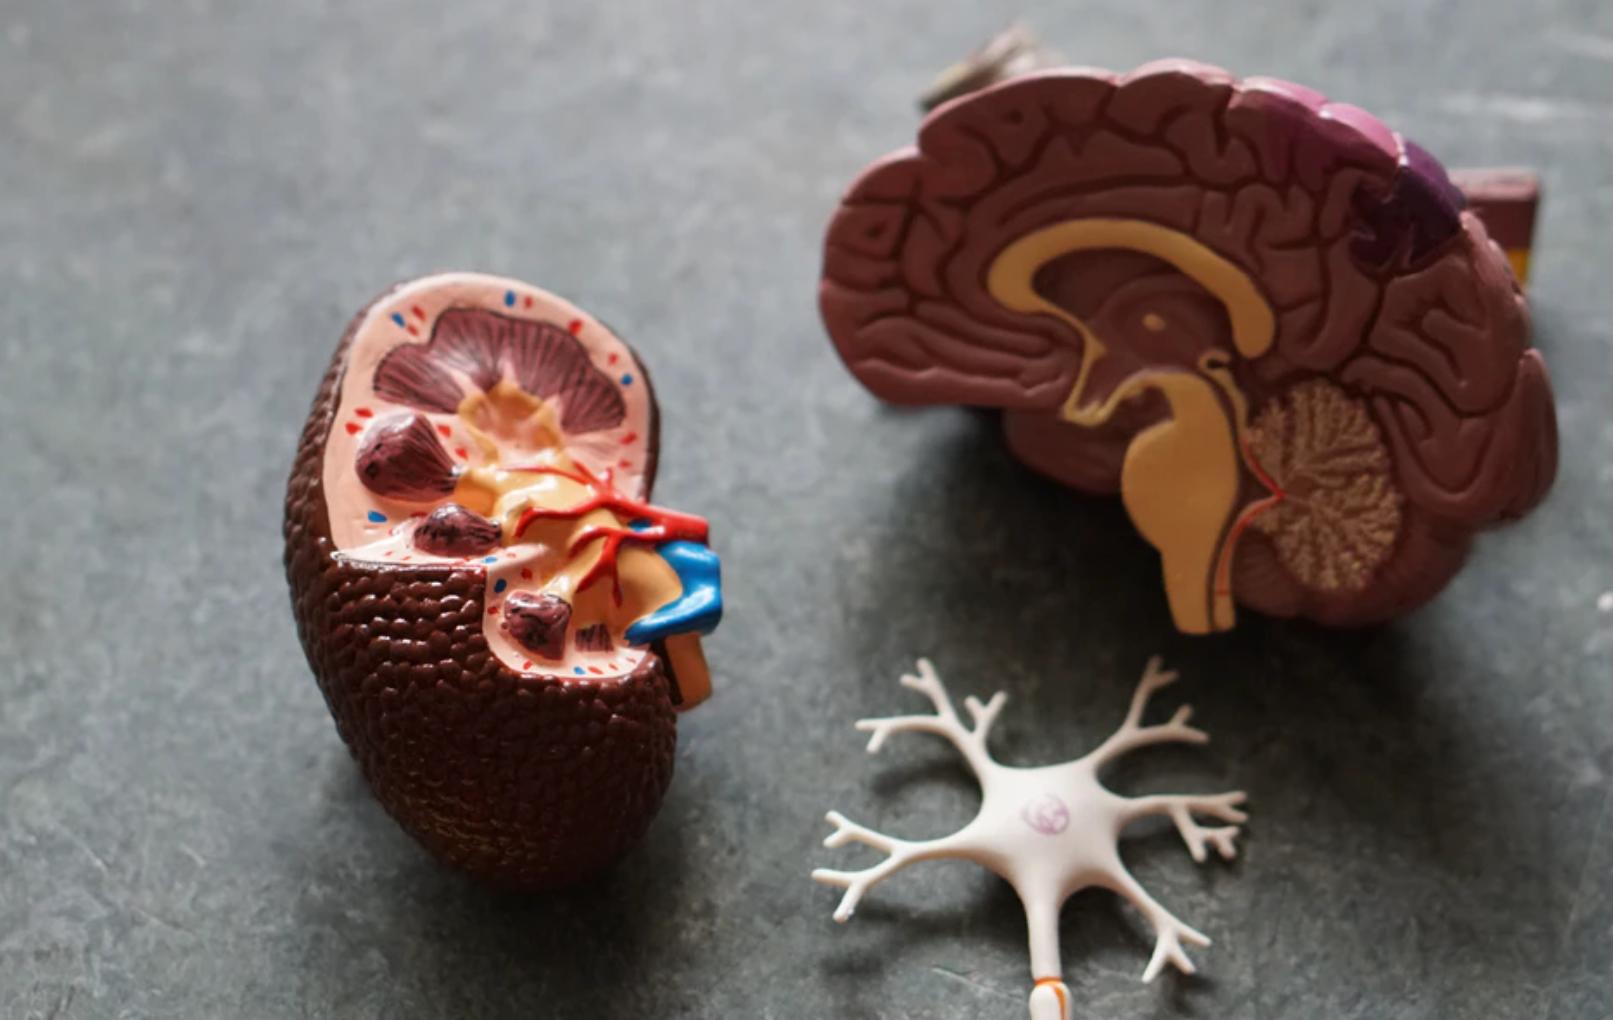 Chronic Kidney Disease and Mental Health